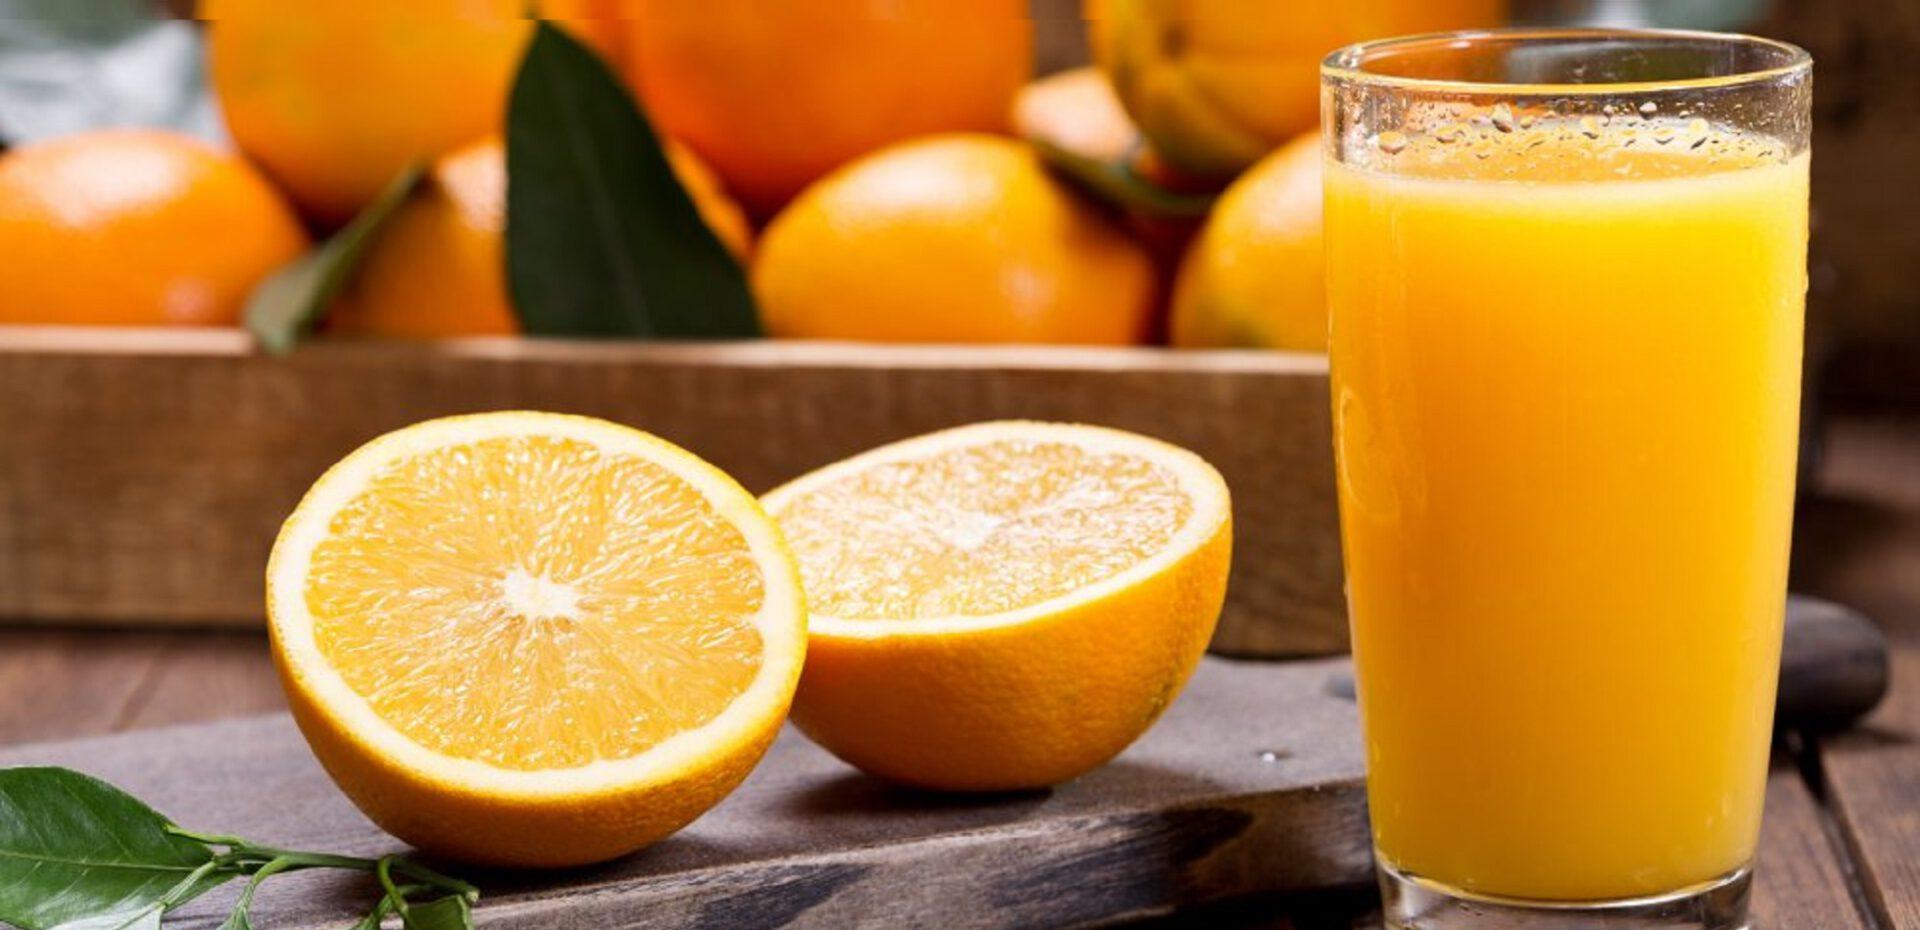 مصرف روزانه آب پرتقال